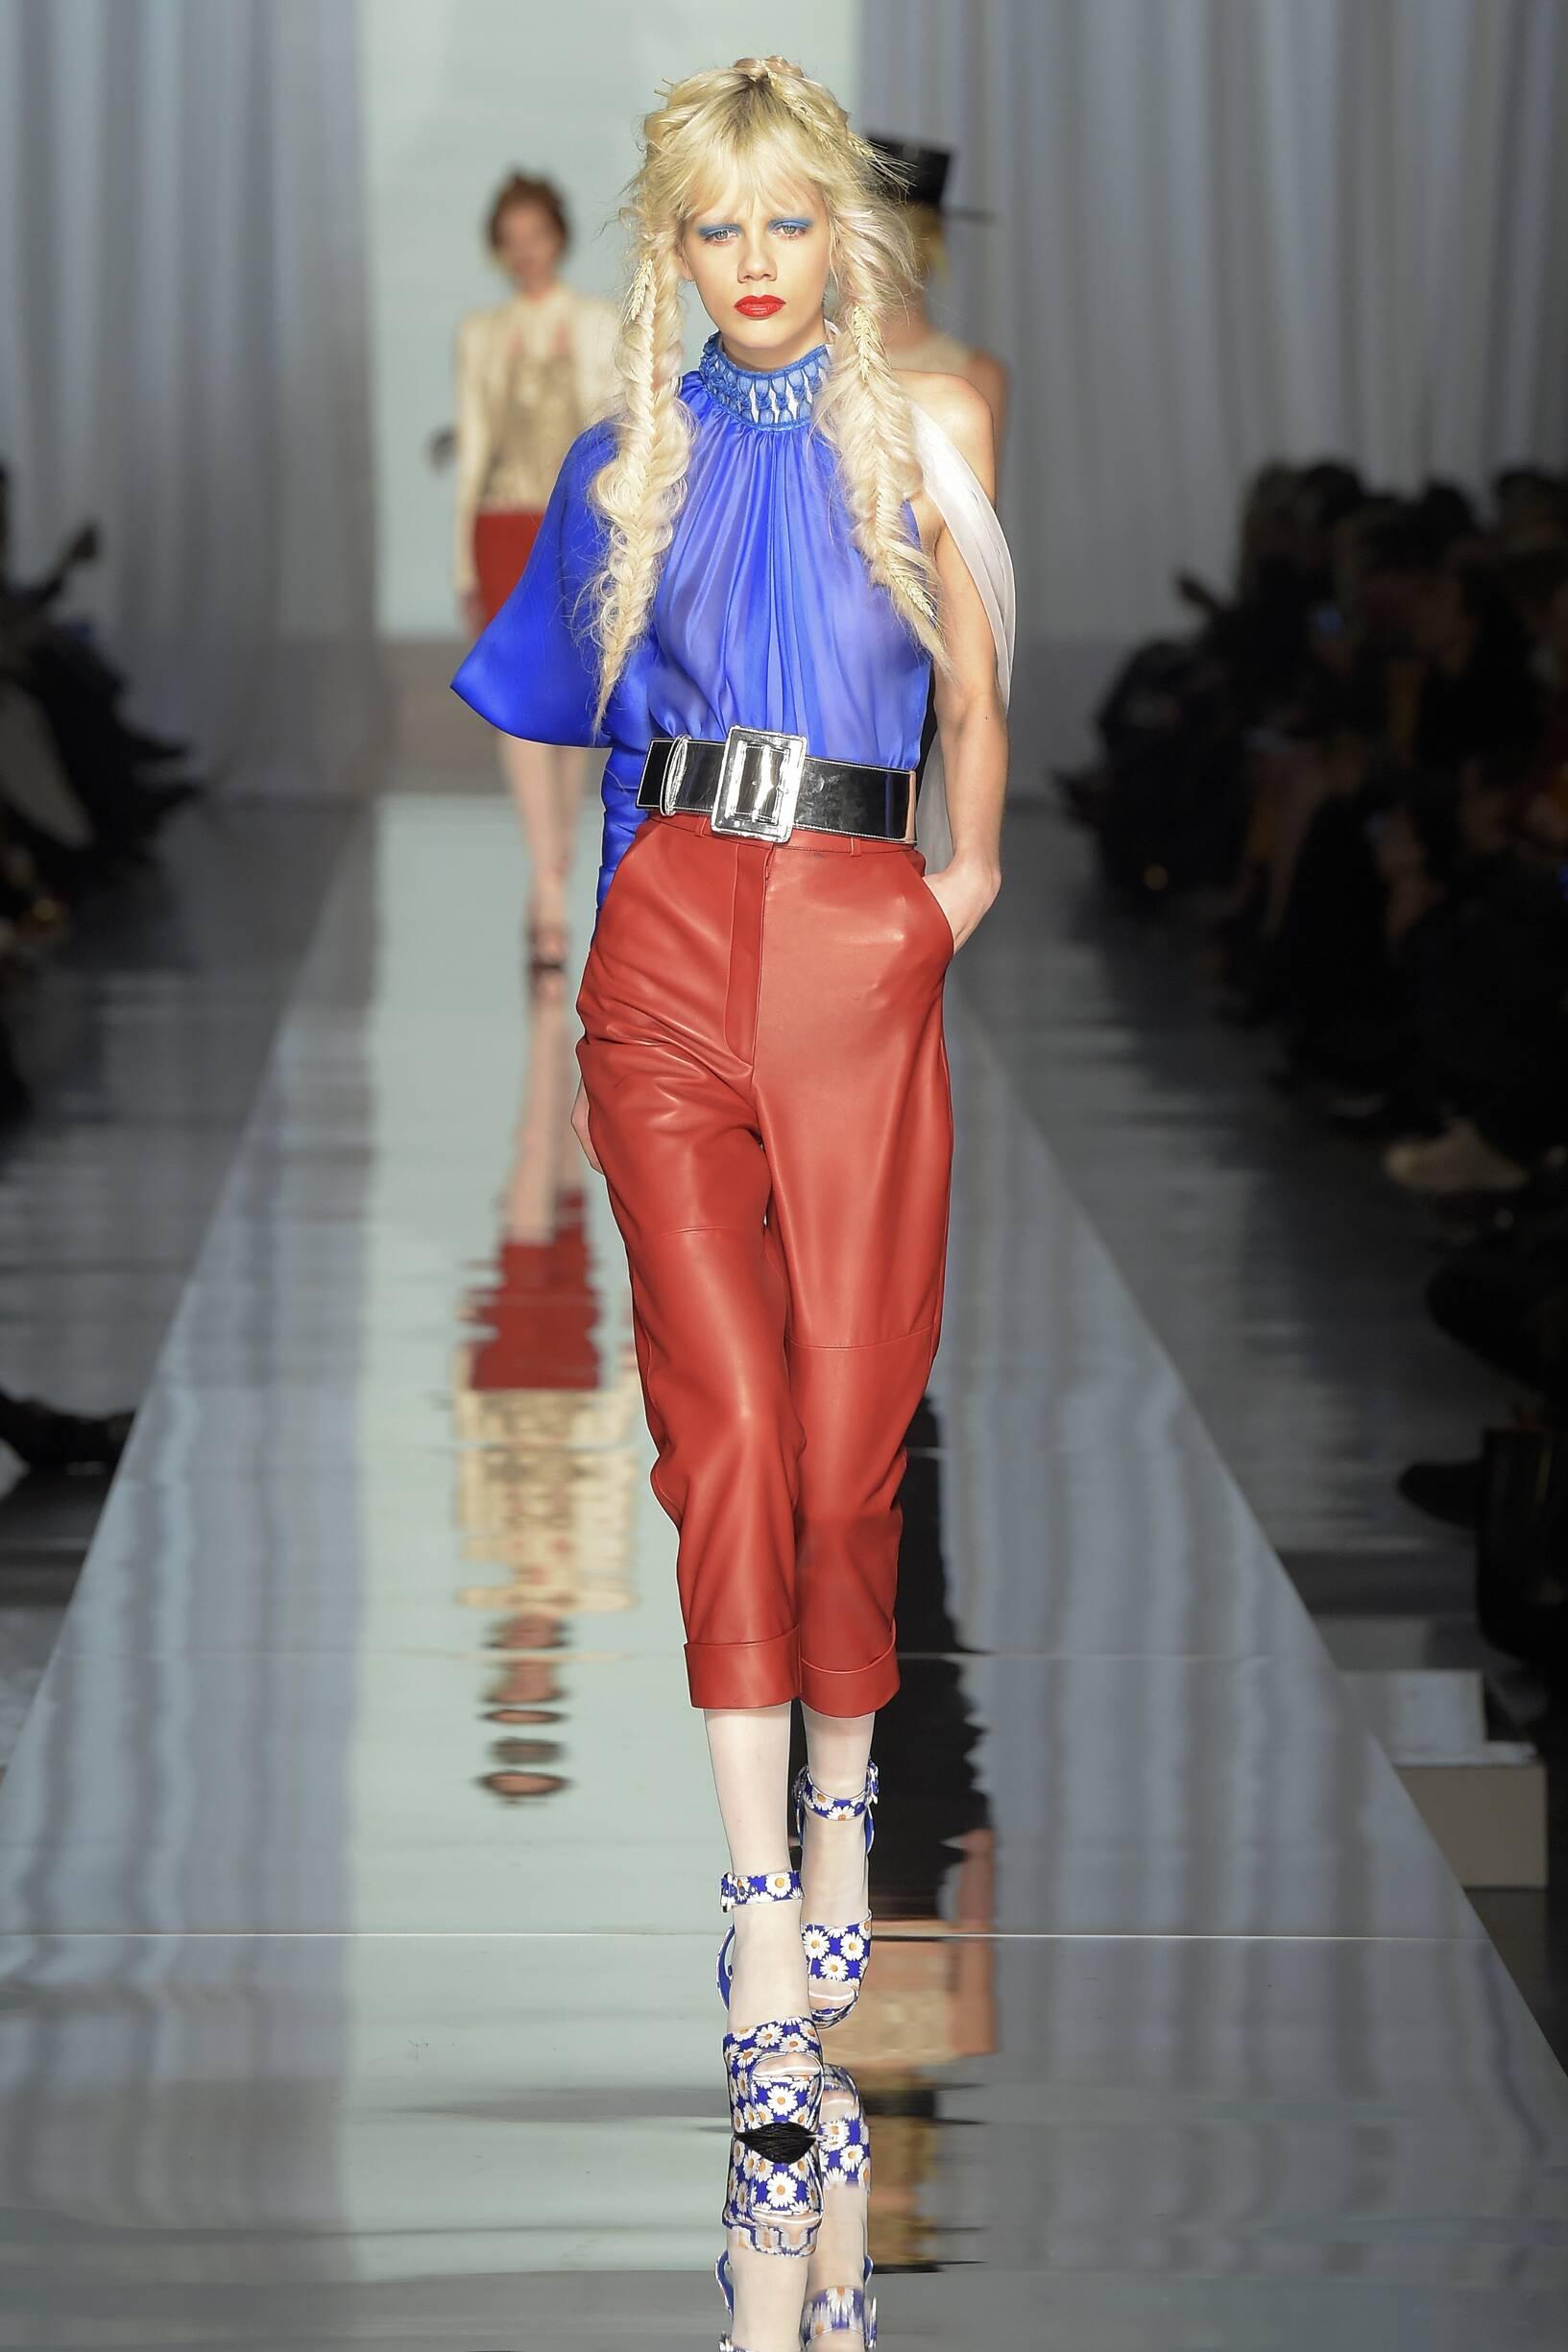 Fashion Woman Model Jean Paul Gaultier Haute Couture Catwalk